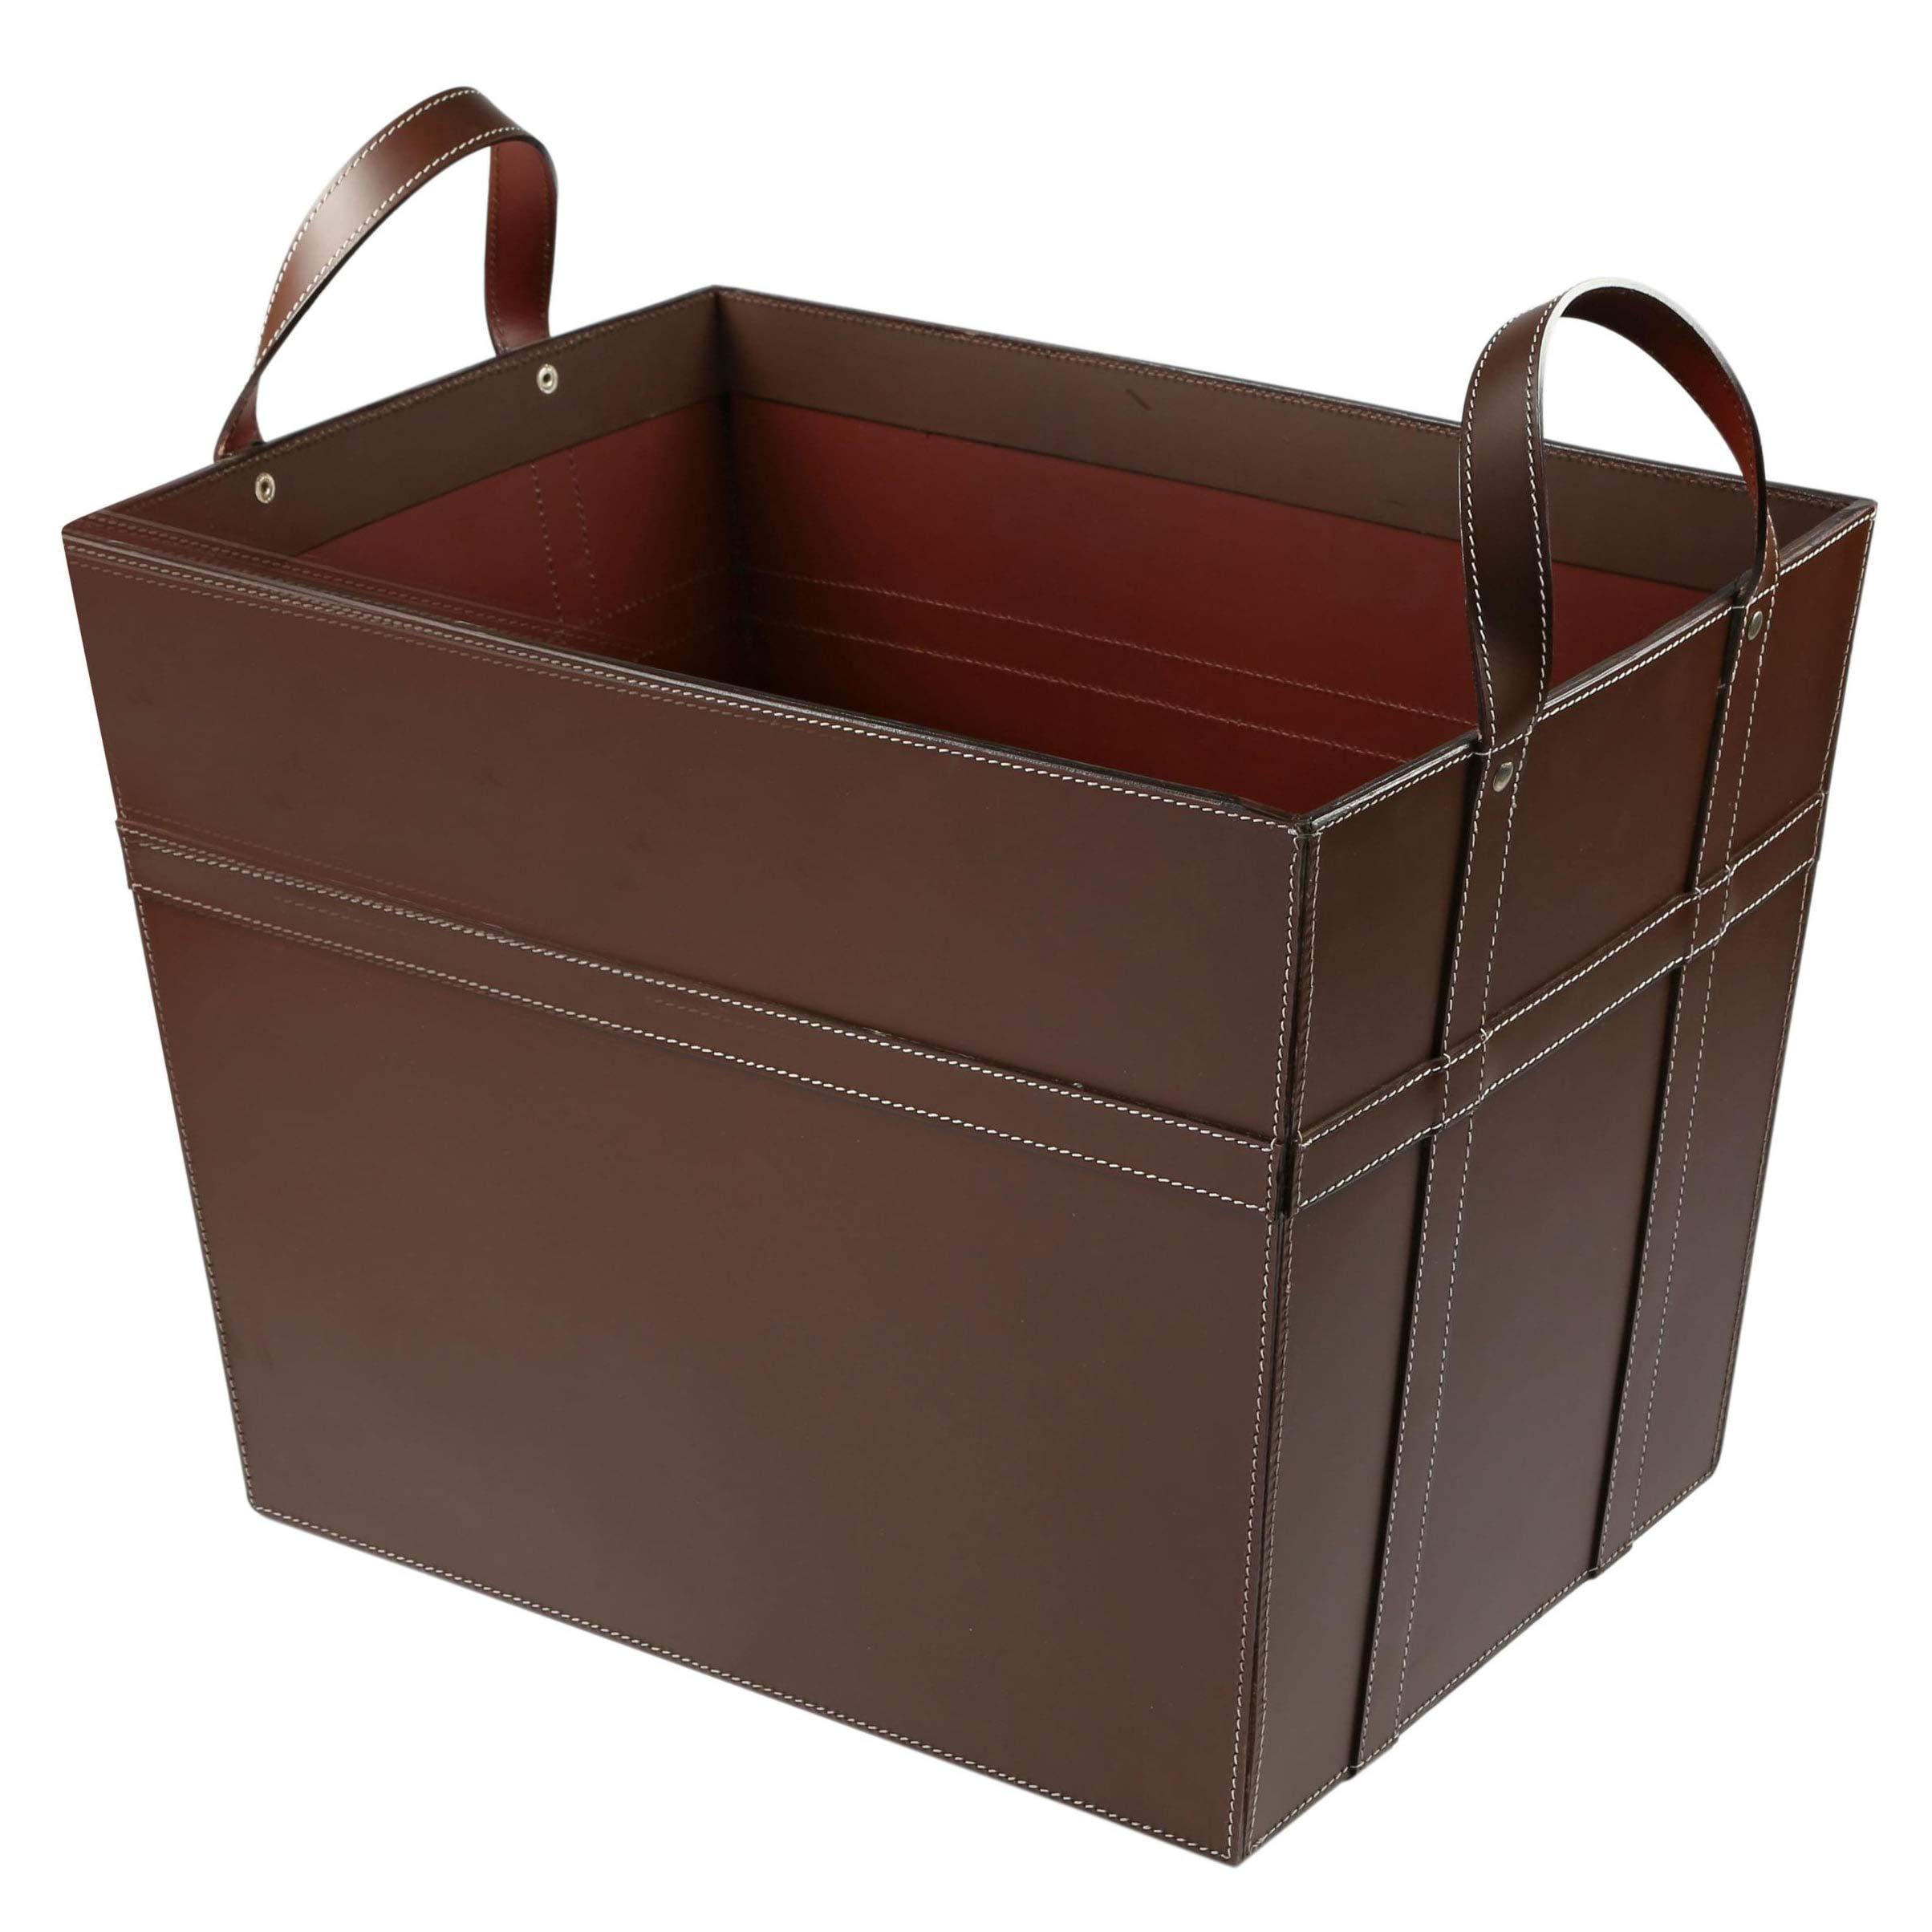 KINDWER Leather Magazine Basket with Handles, Brown